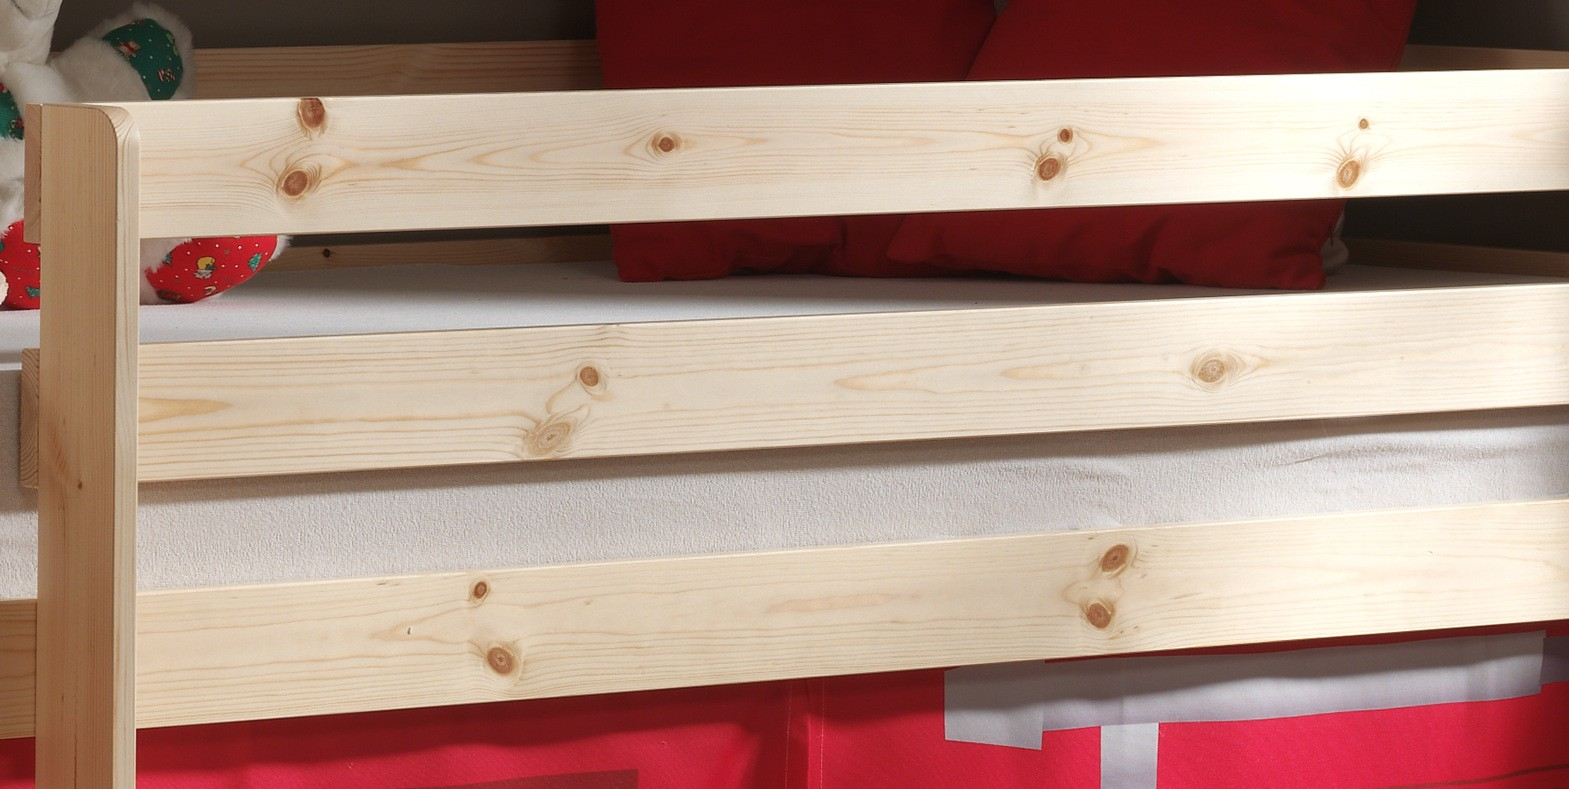 neu spielbett pino feuerwehr kinderbett hochbett. Black Bedroom Furniture Sets. Home Design Ideas